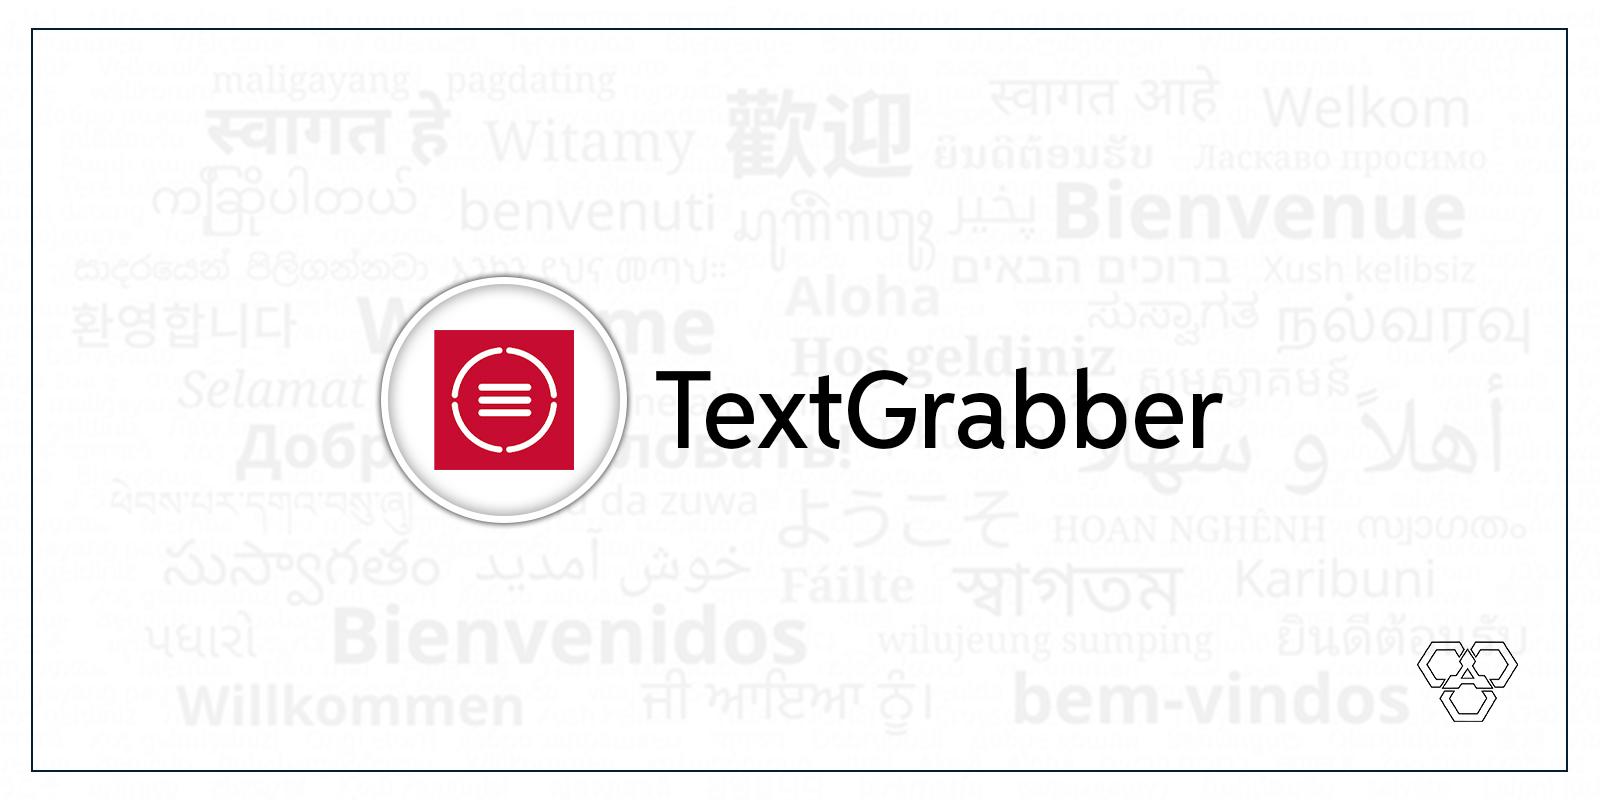 TextGrabber app